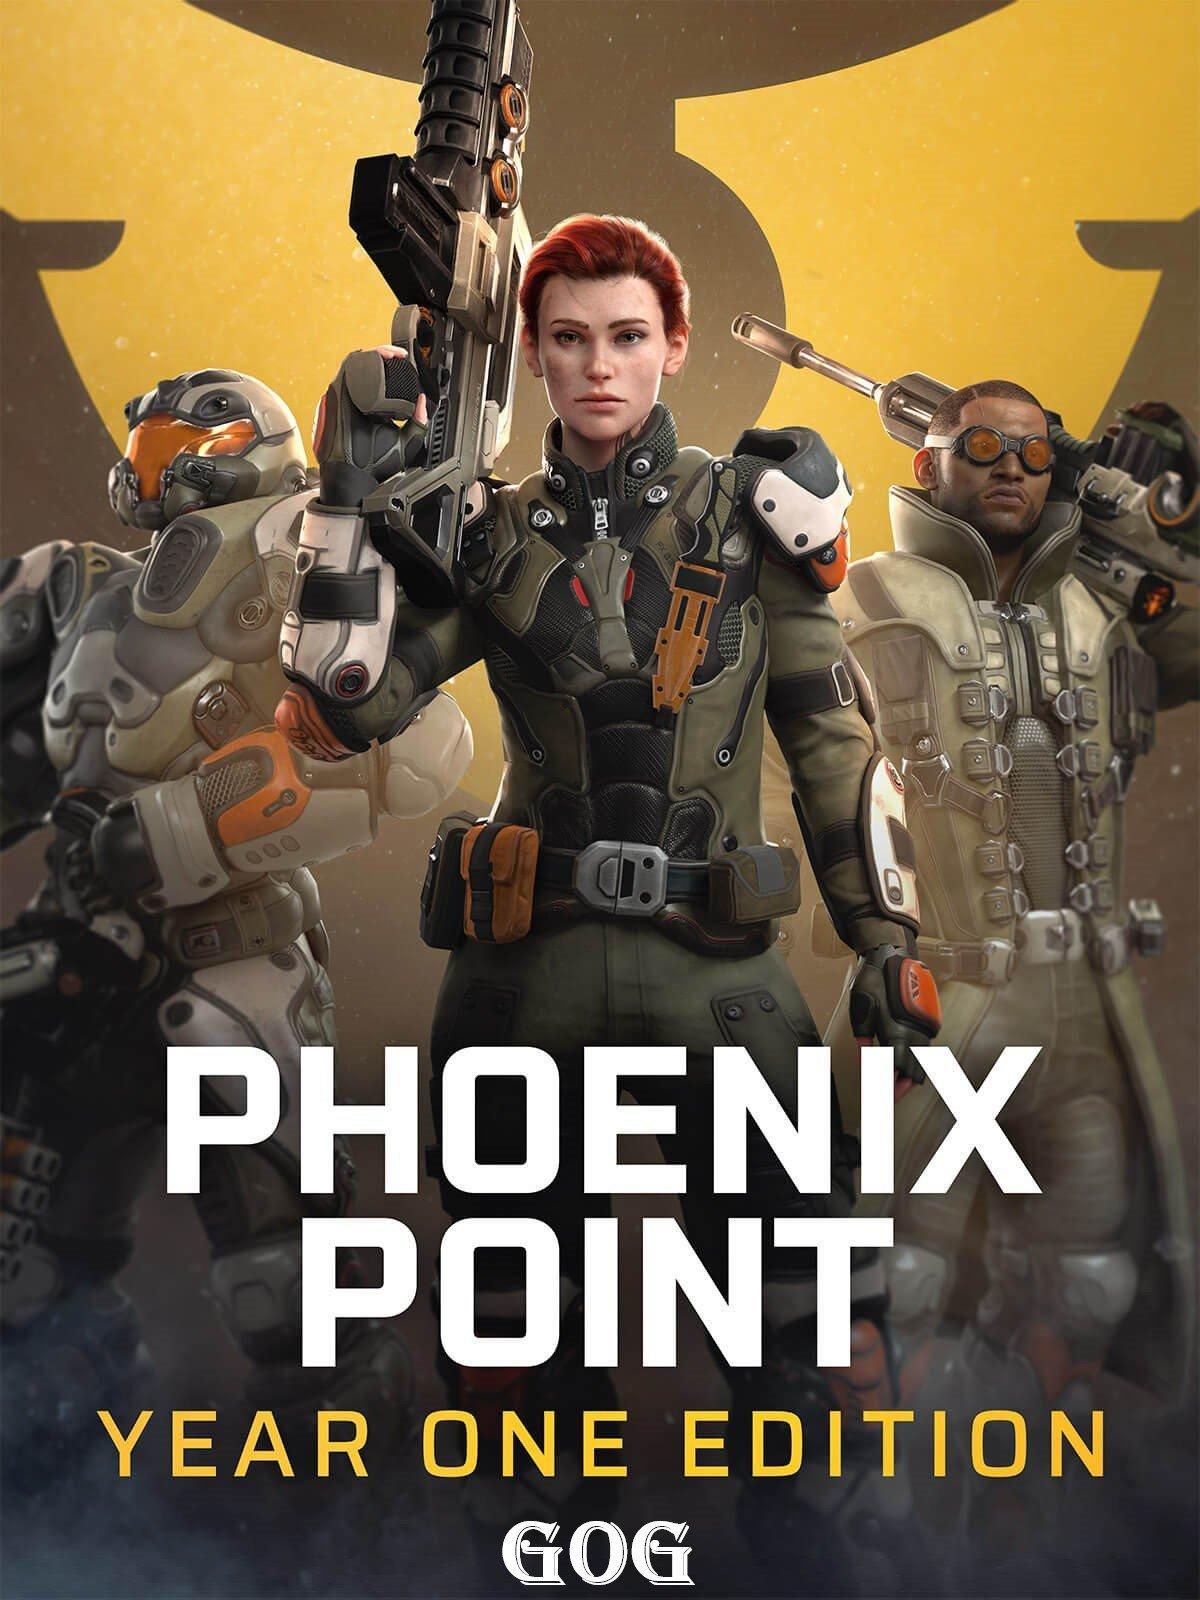 Phoenix Point: Year One Edition v.1.10 [GOG] (2019) Лицензия